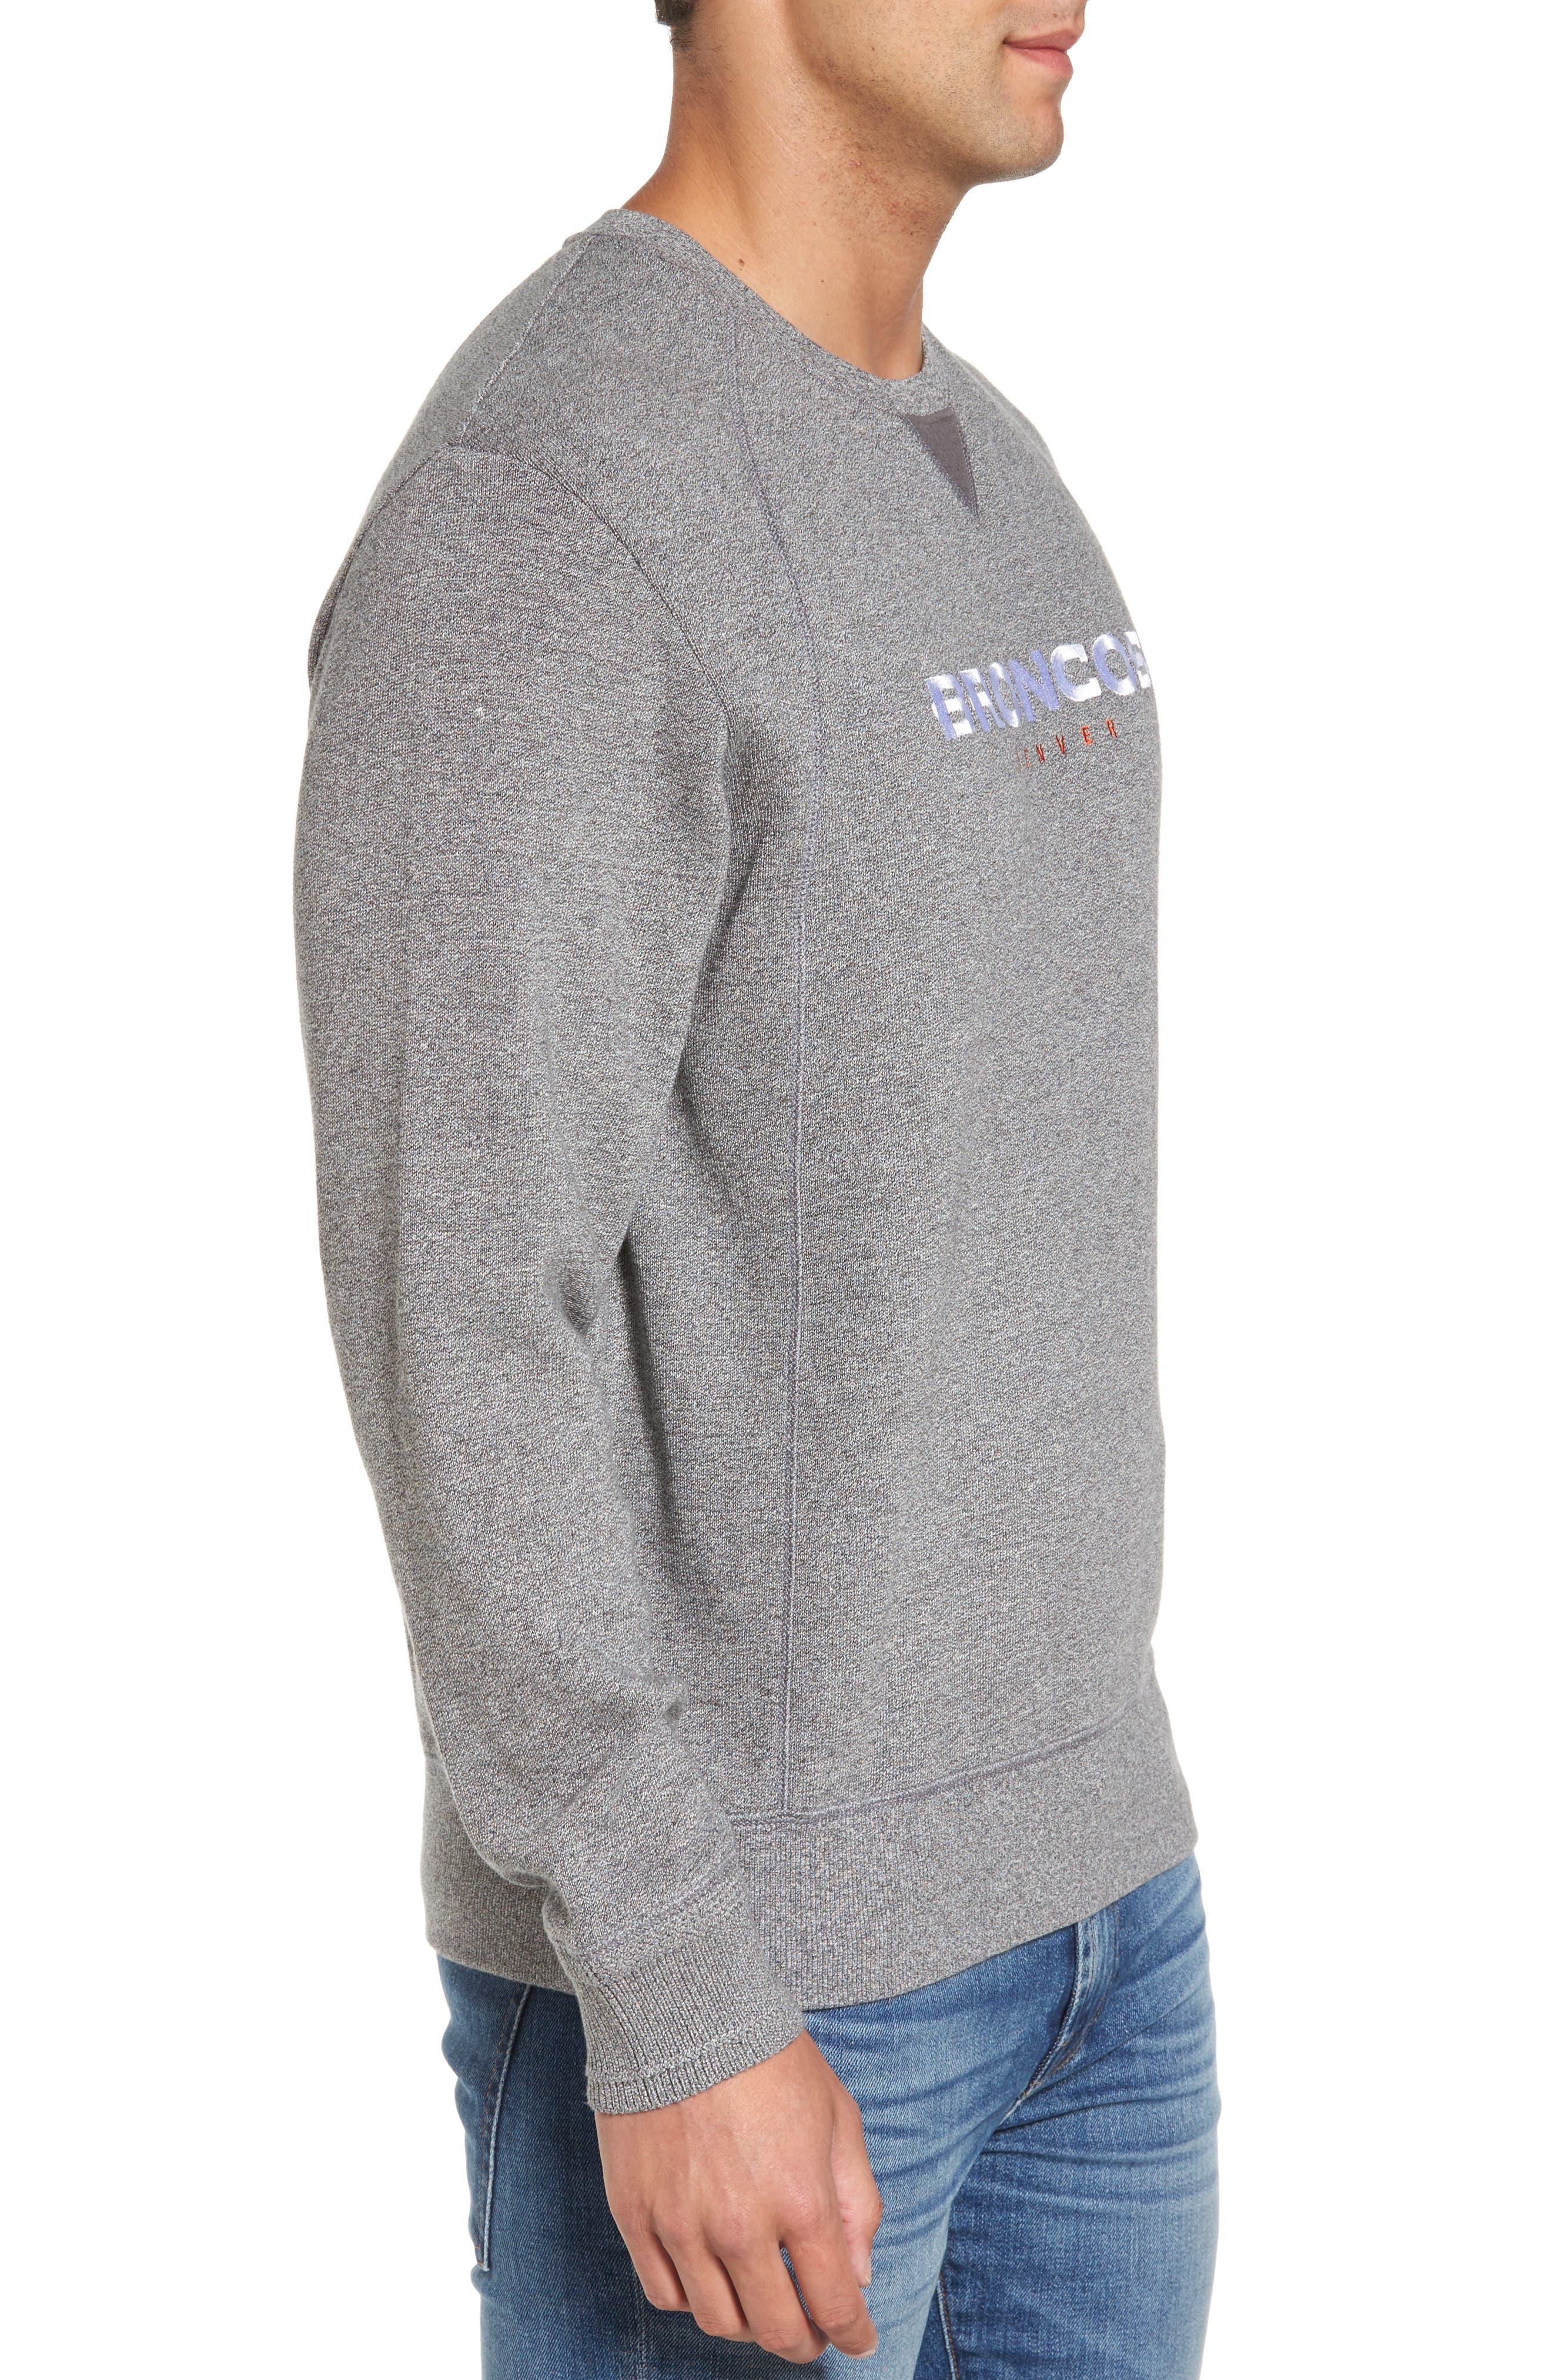 NFL Stitch of Liberty Embroidered Crewneck Sweatshirt,                             Alternate thumbnail 68, color,